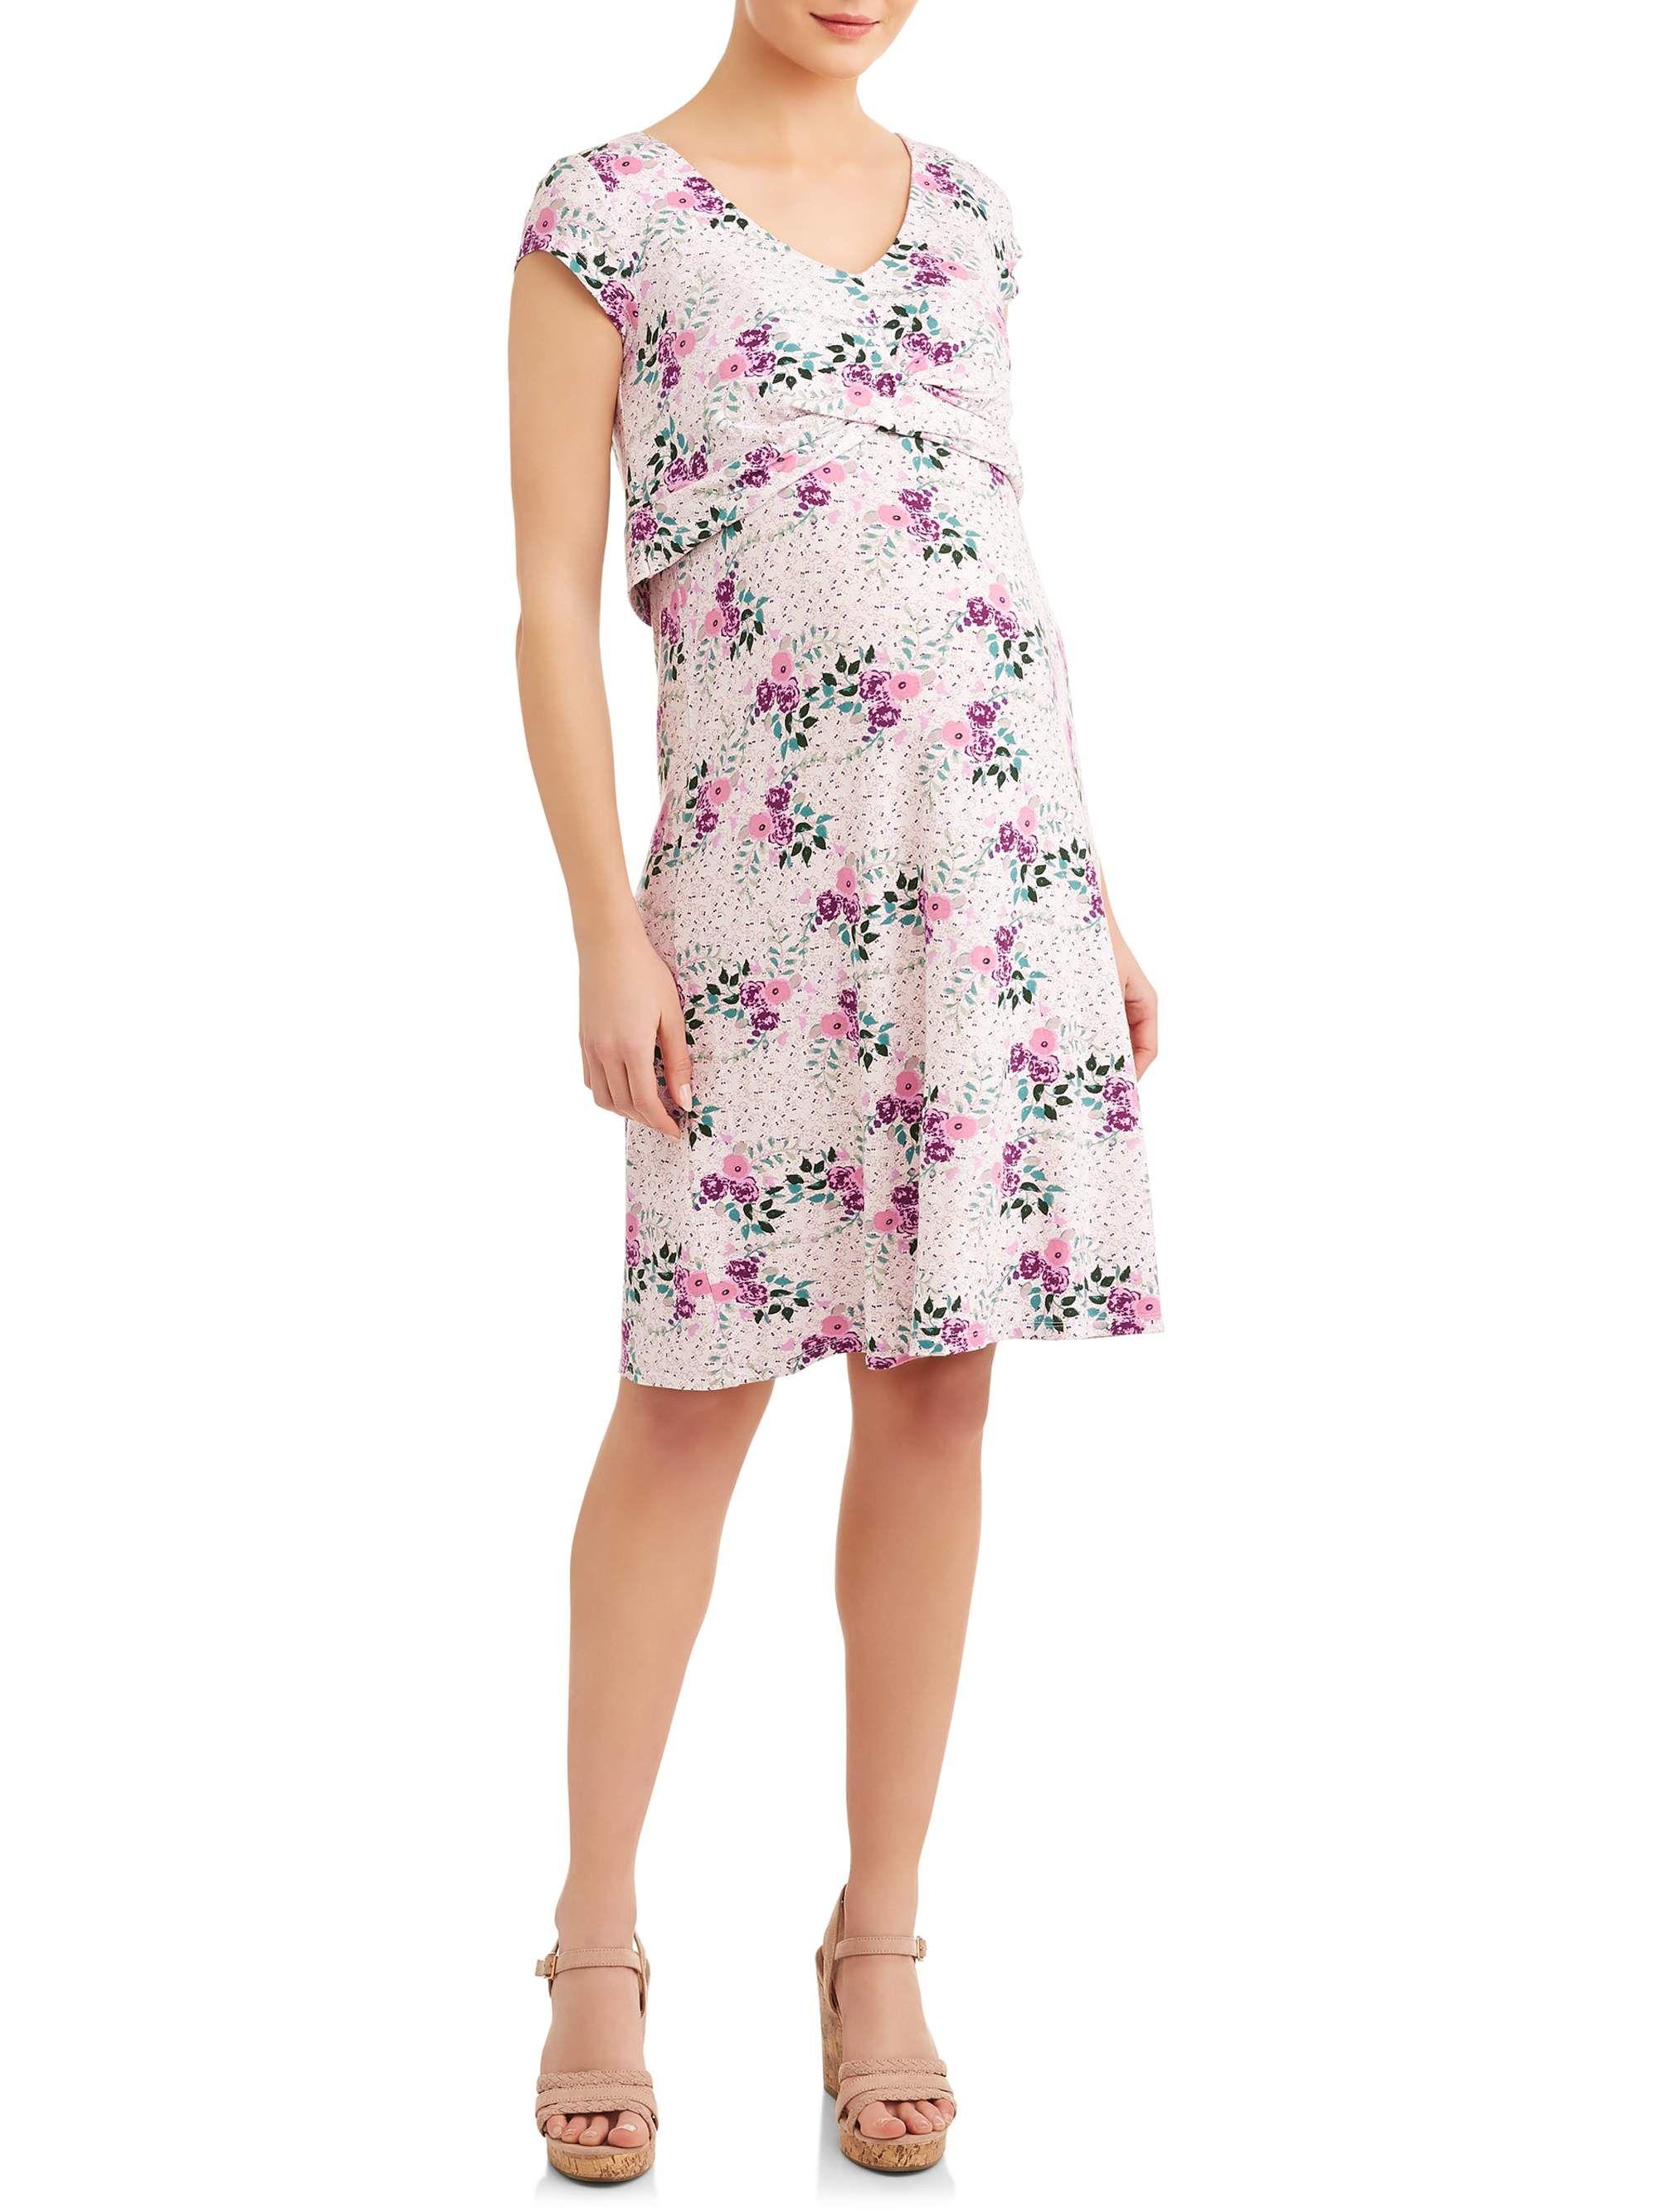 Maternity Cap Sleeve Lift Up A Line Nursing Wrap Dress Ad Sleeve Ad Lift Maternity Wrap Dress Dresses Casual Dress [ 2667 x 2000 Pixel ]